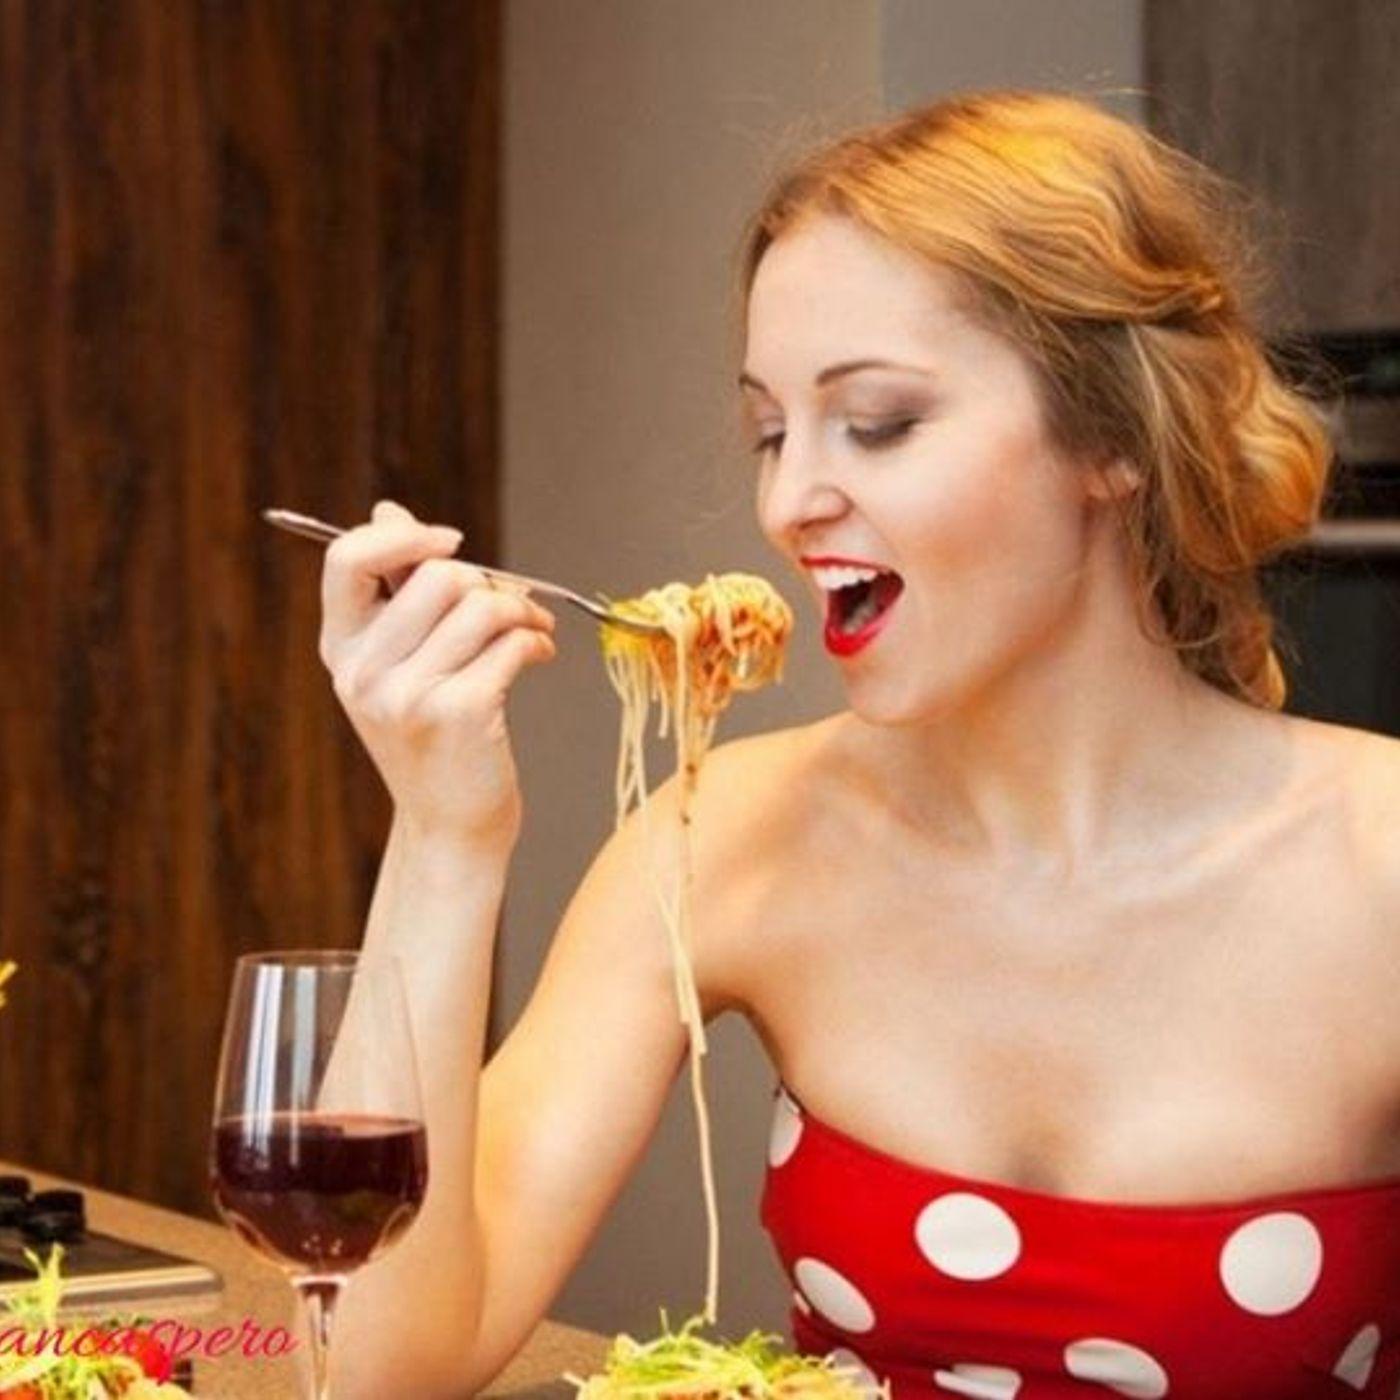 Eating Emozionale